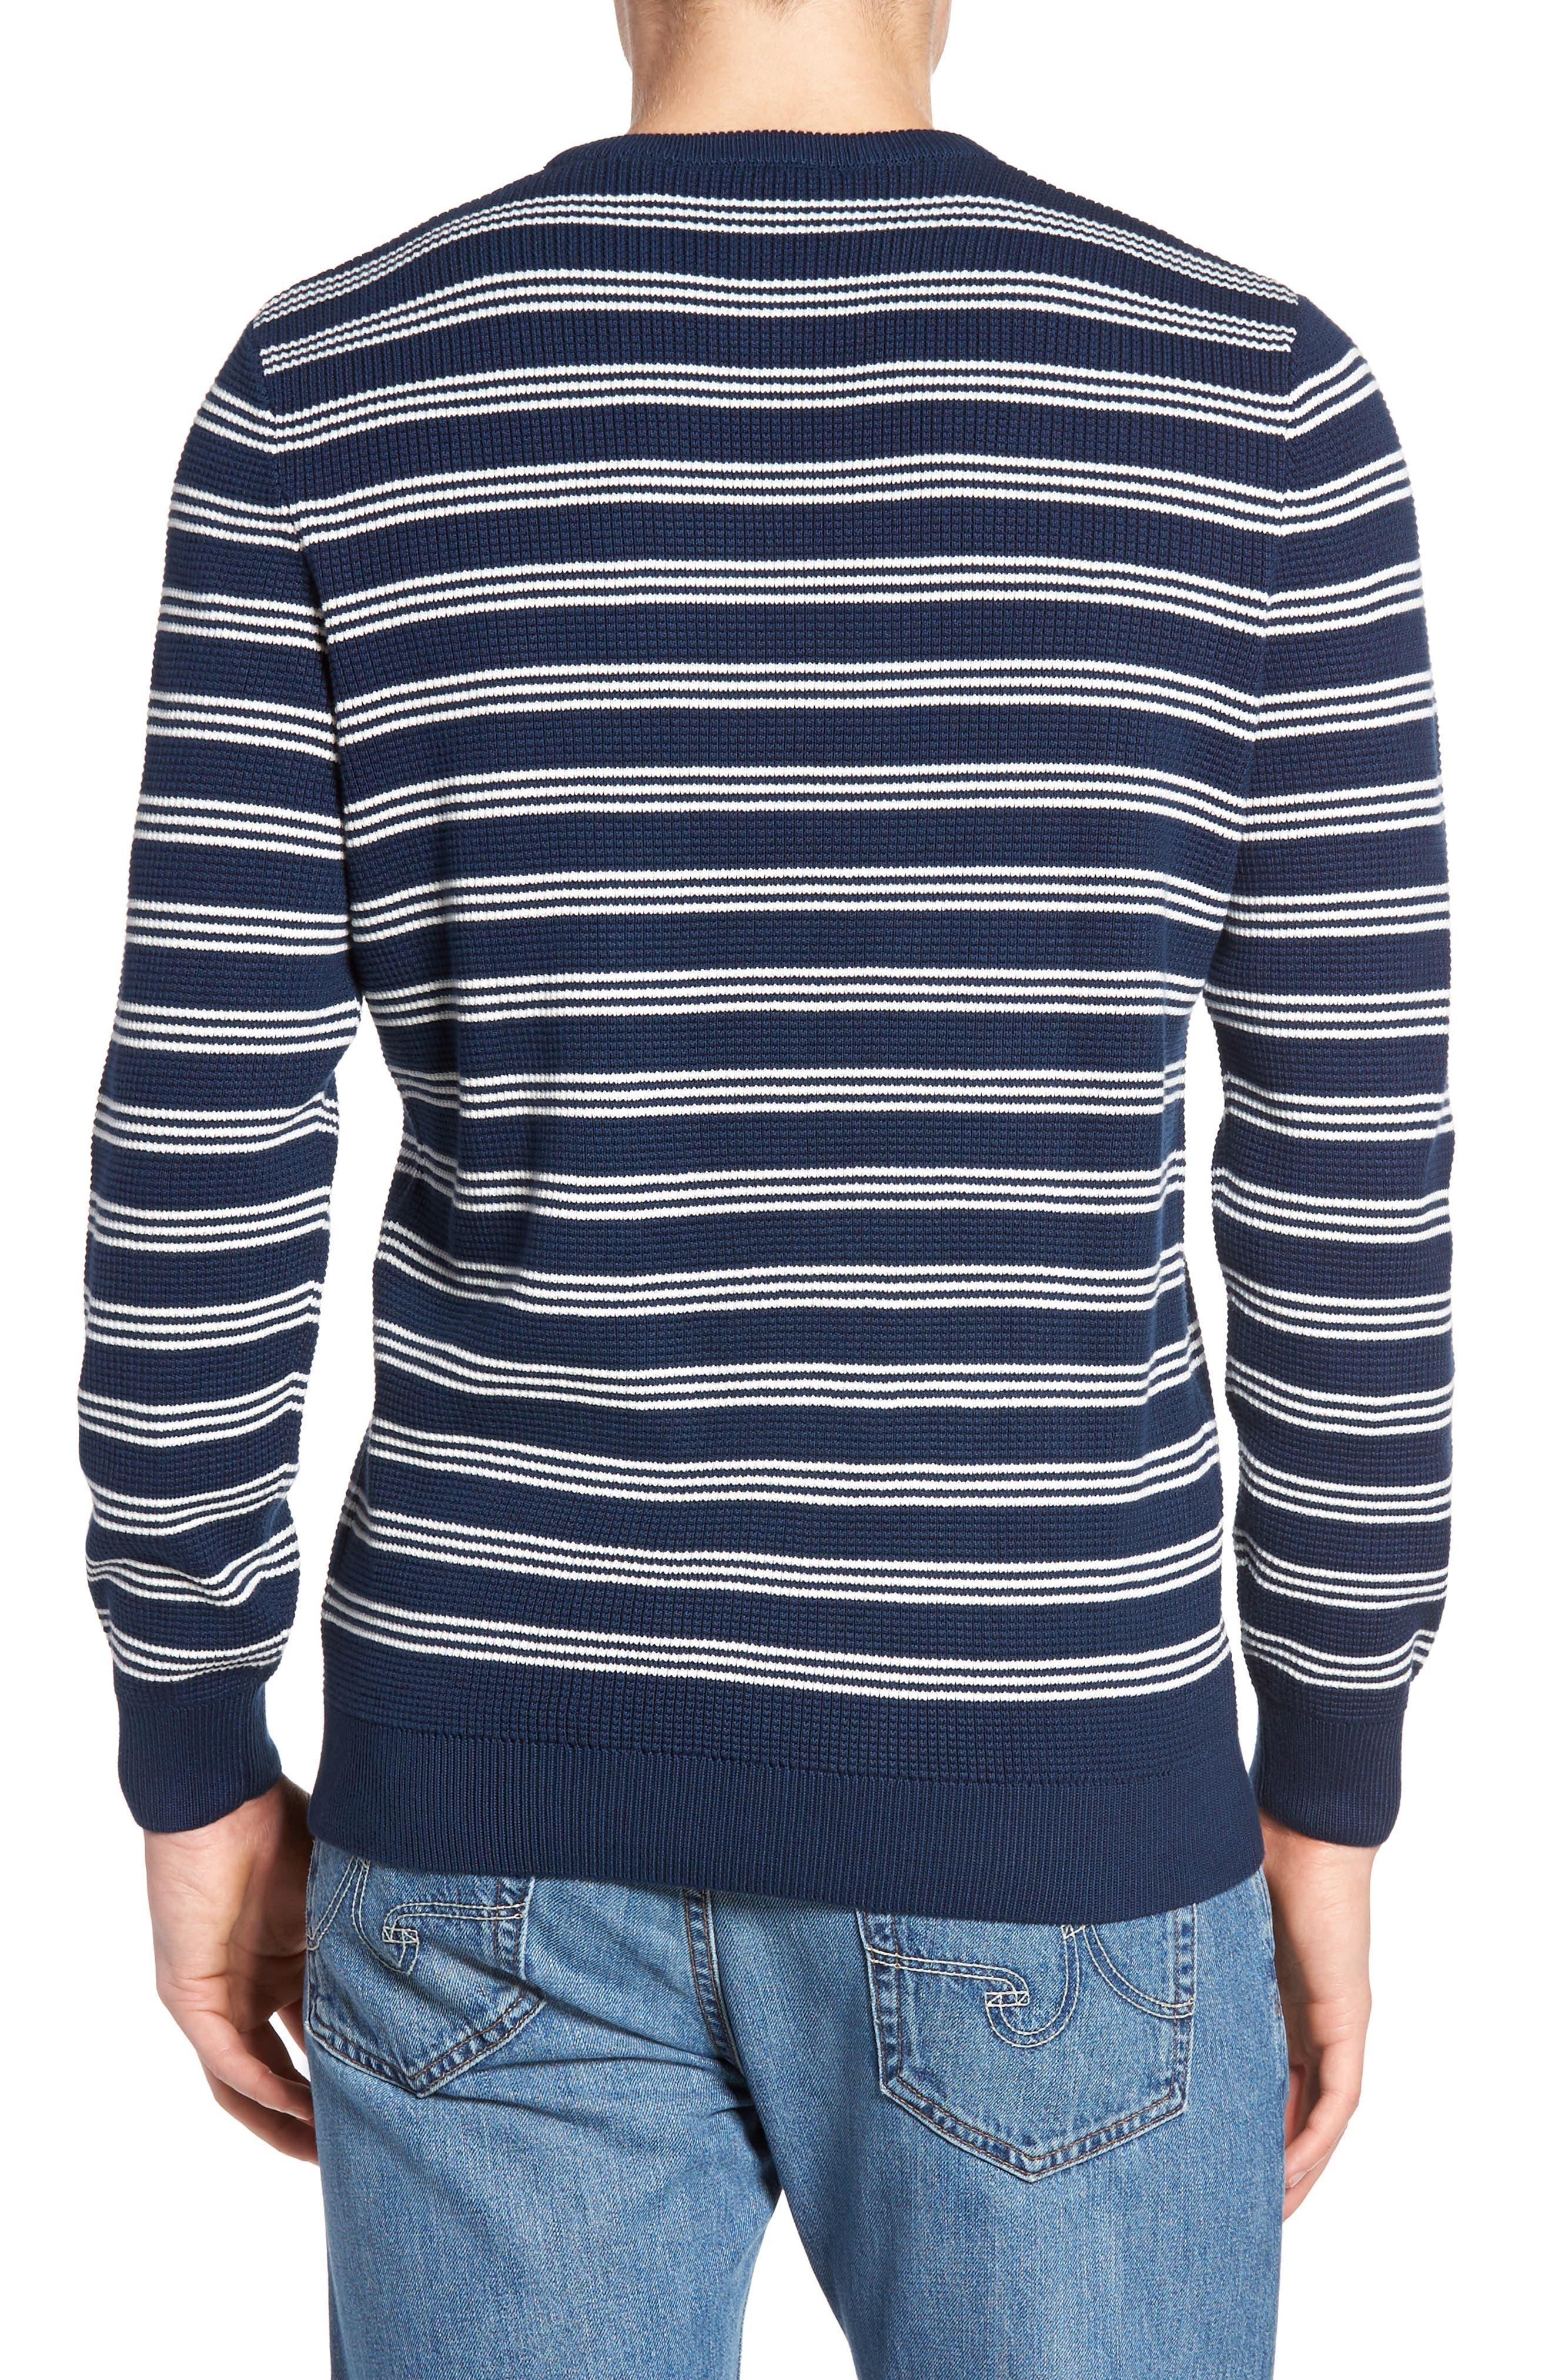 Alternate Image 2  - Lacoste Waffle Stitch Stripe Sweater